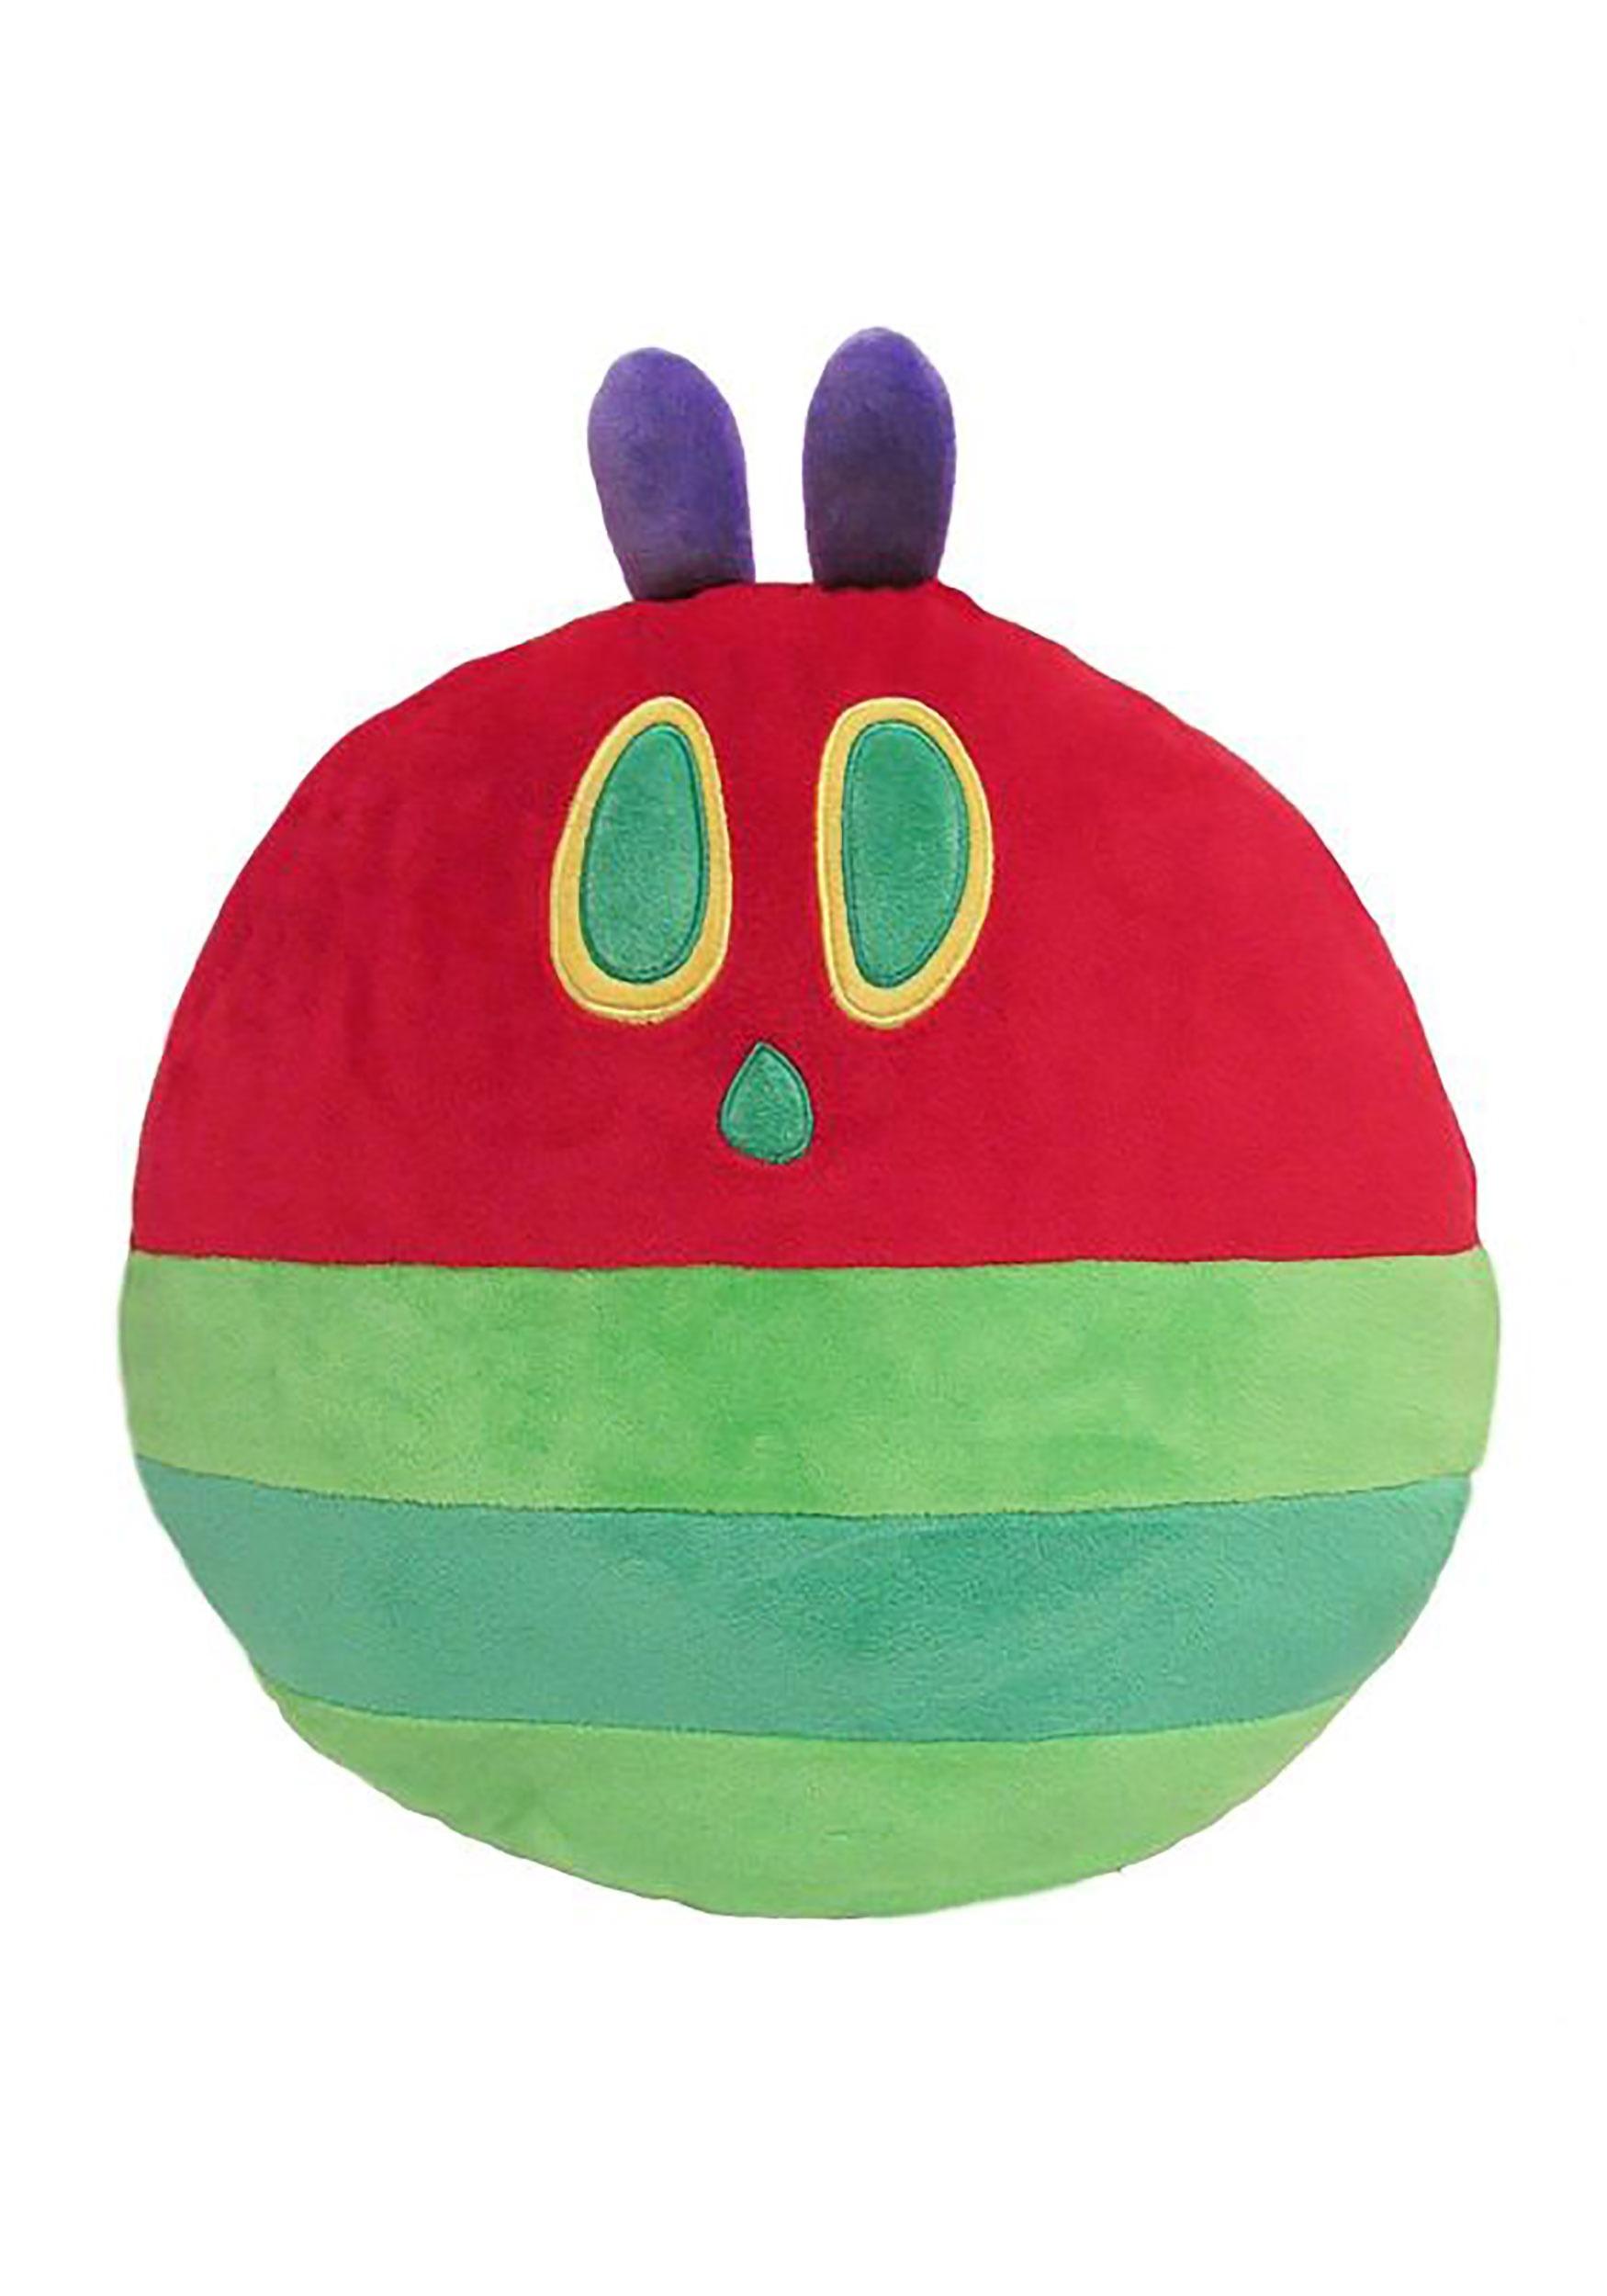 The Very Hungry Caterpillar Pocket Pillow